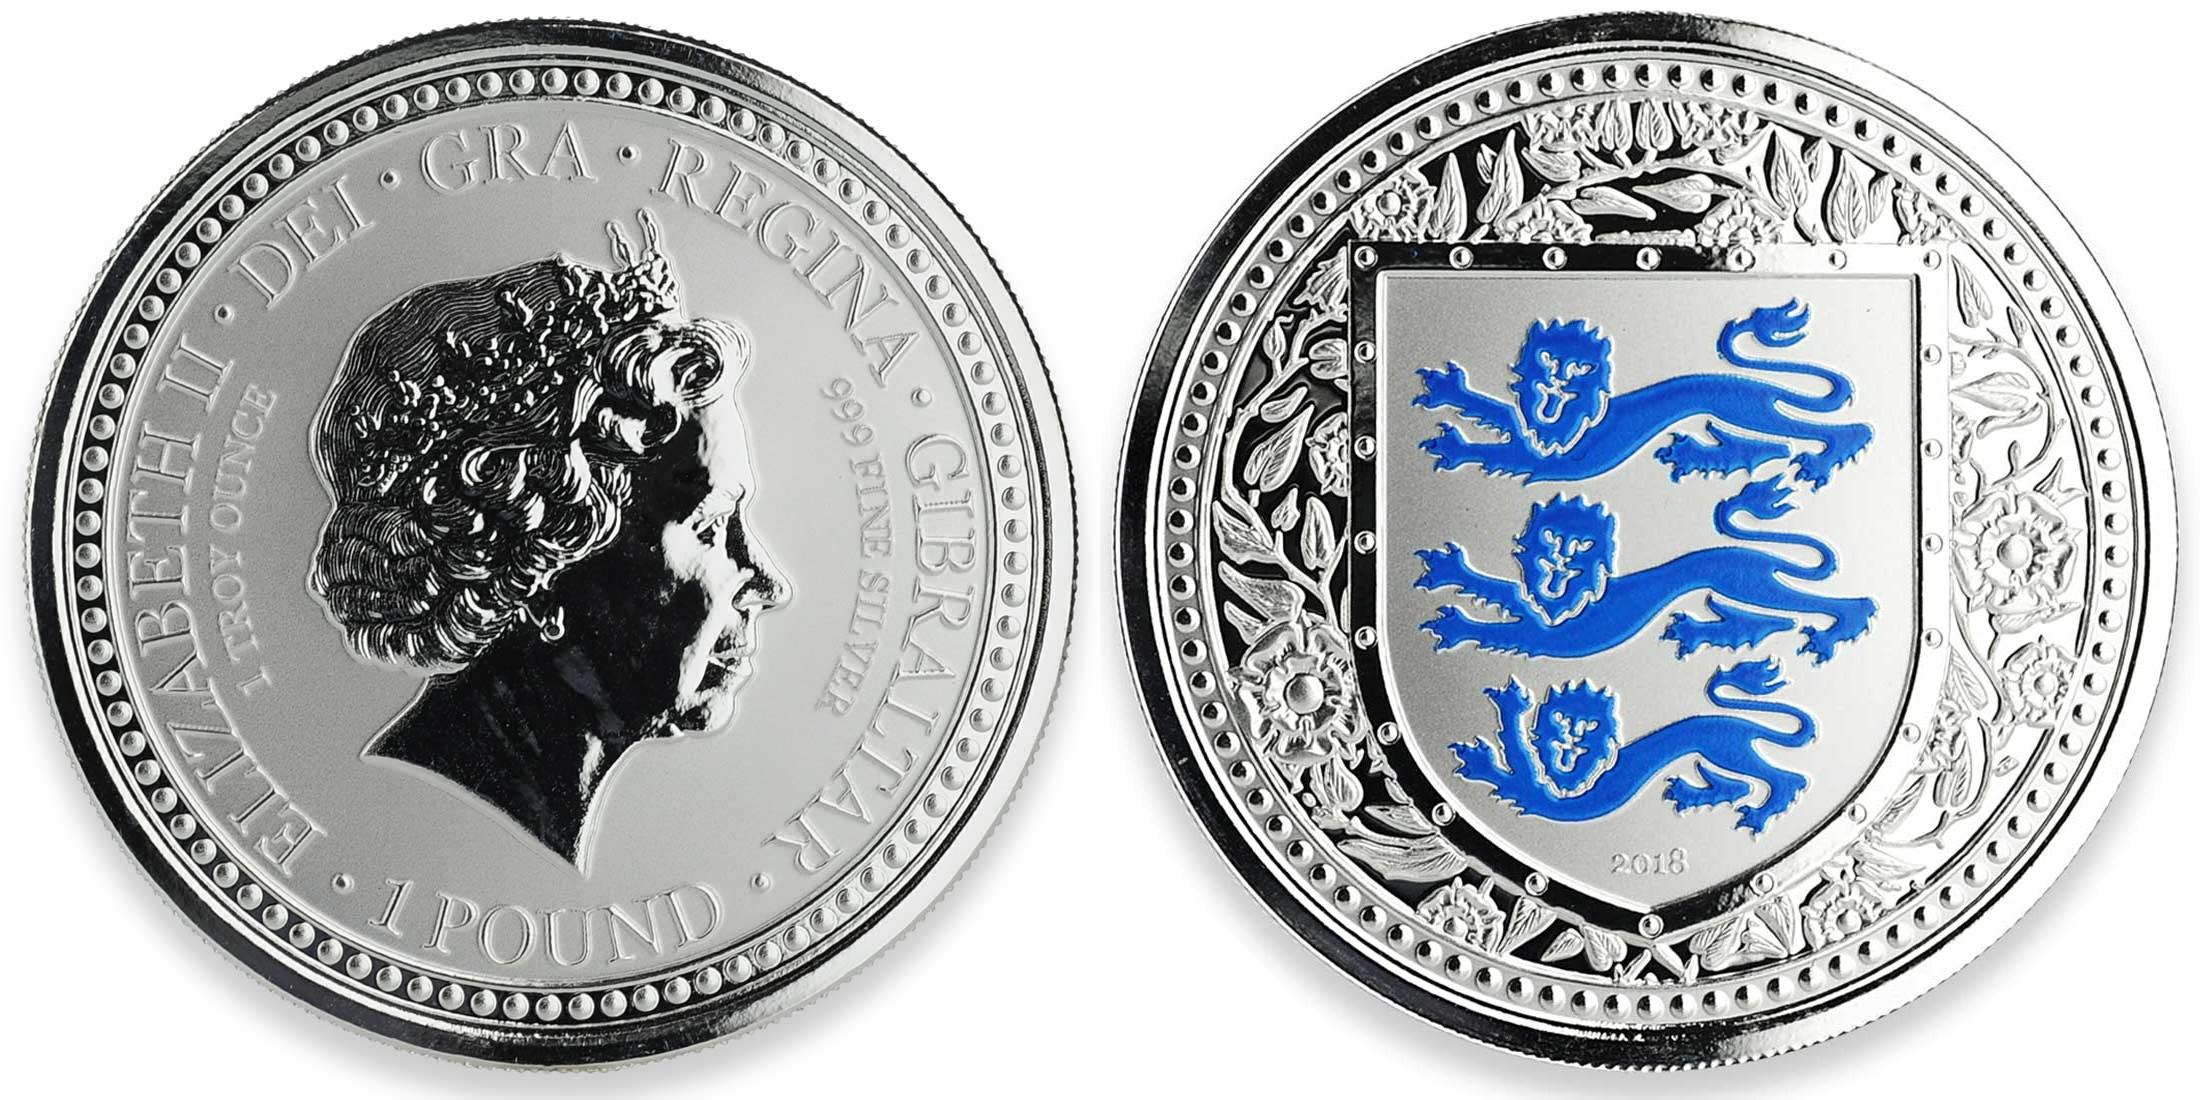 gibraltar 2018 armes royales d'angleterre bleu